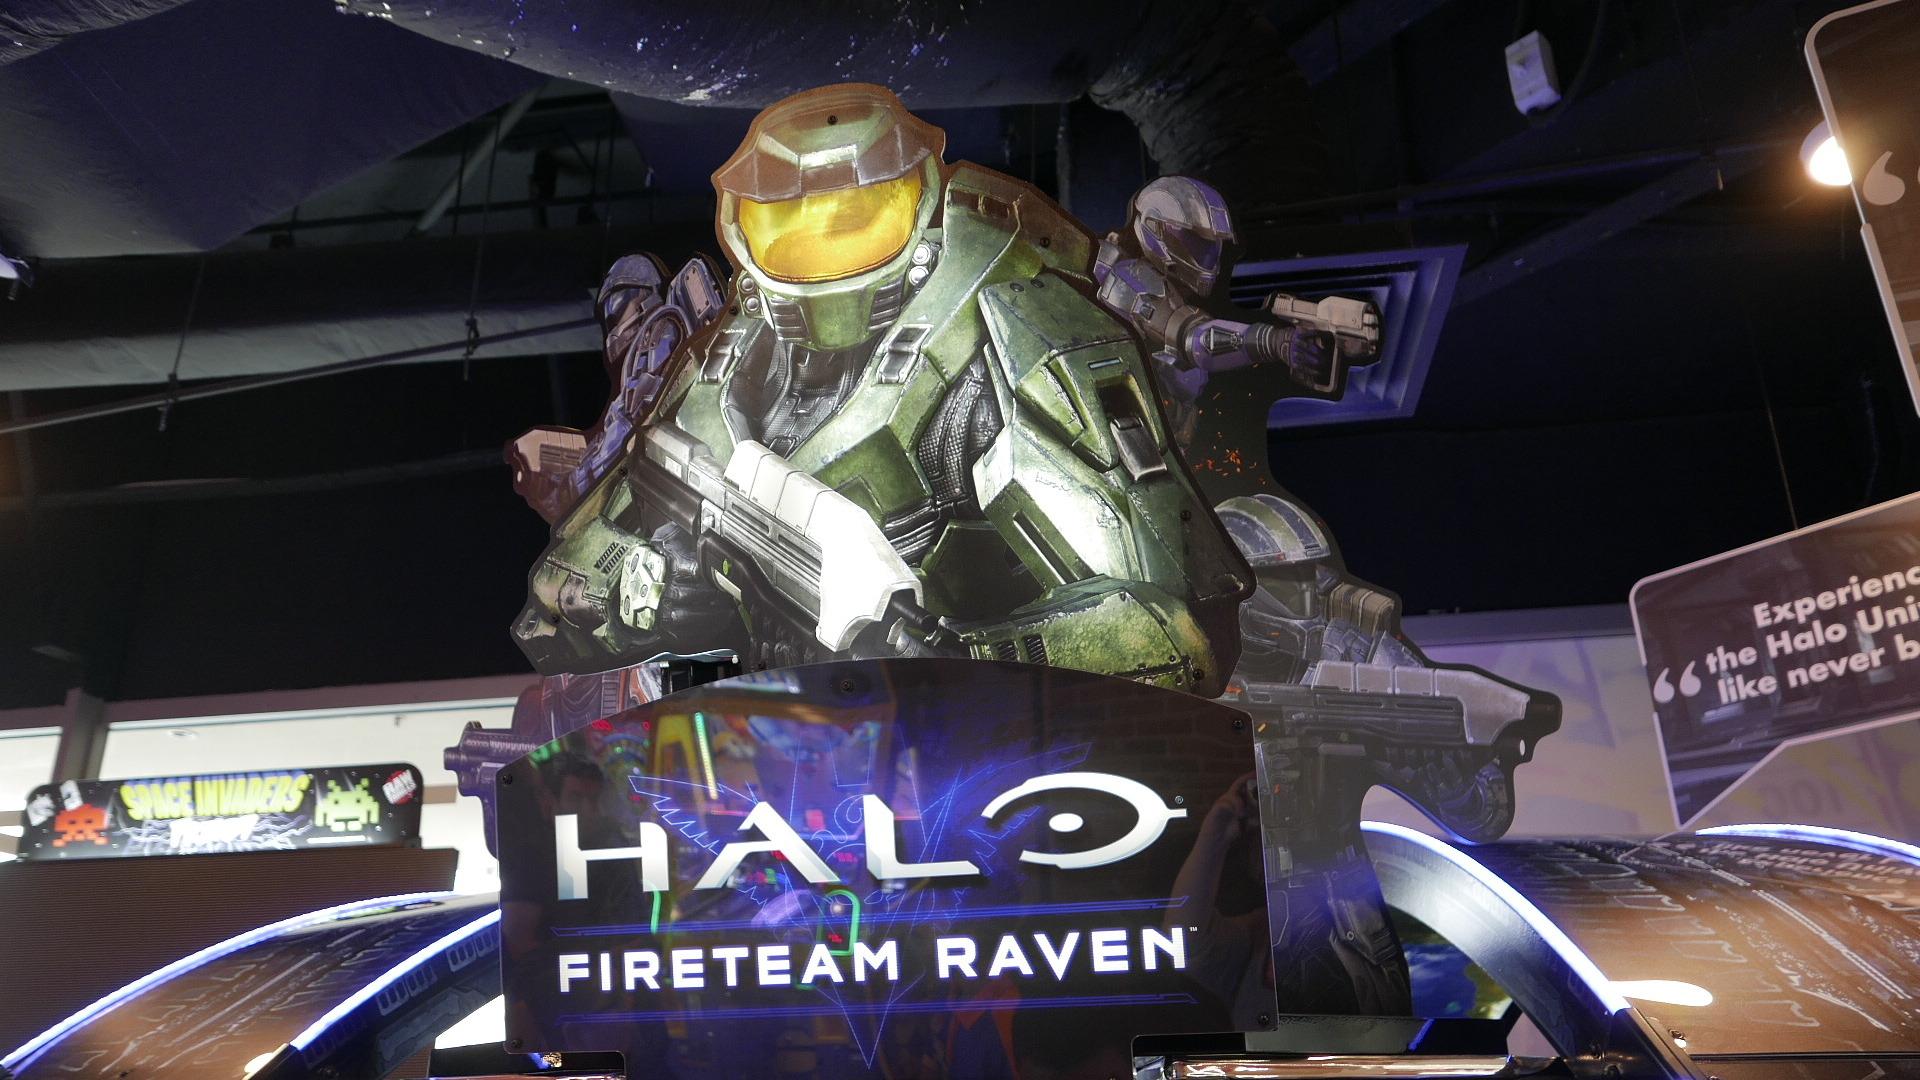 Halo: Fireteam Raven 30/07/18 01